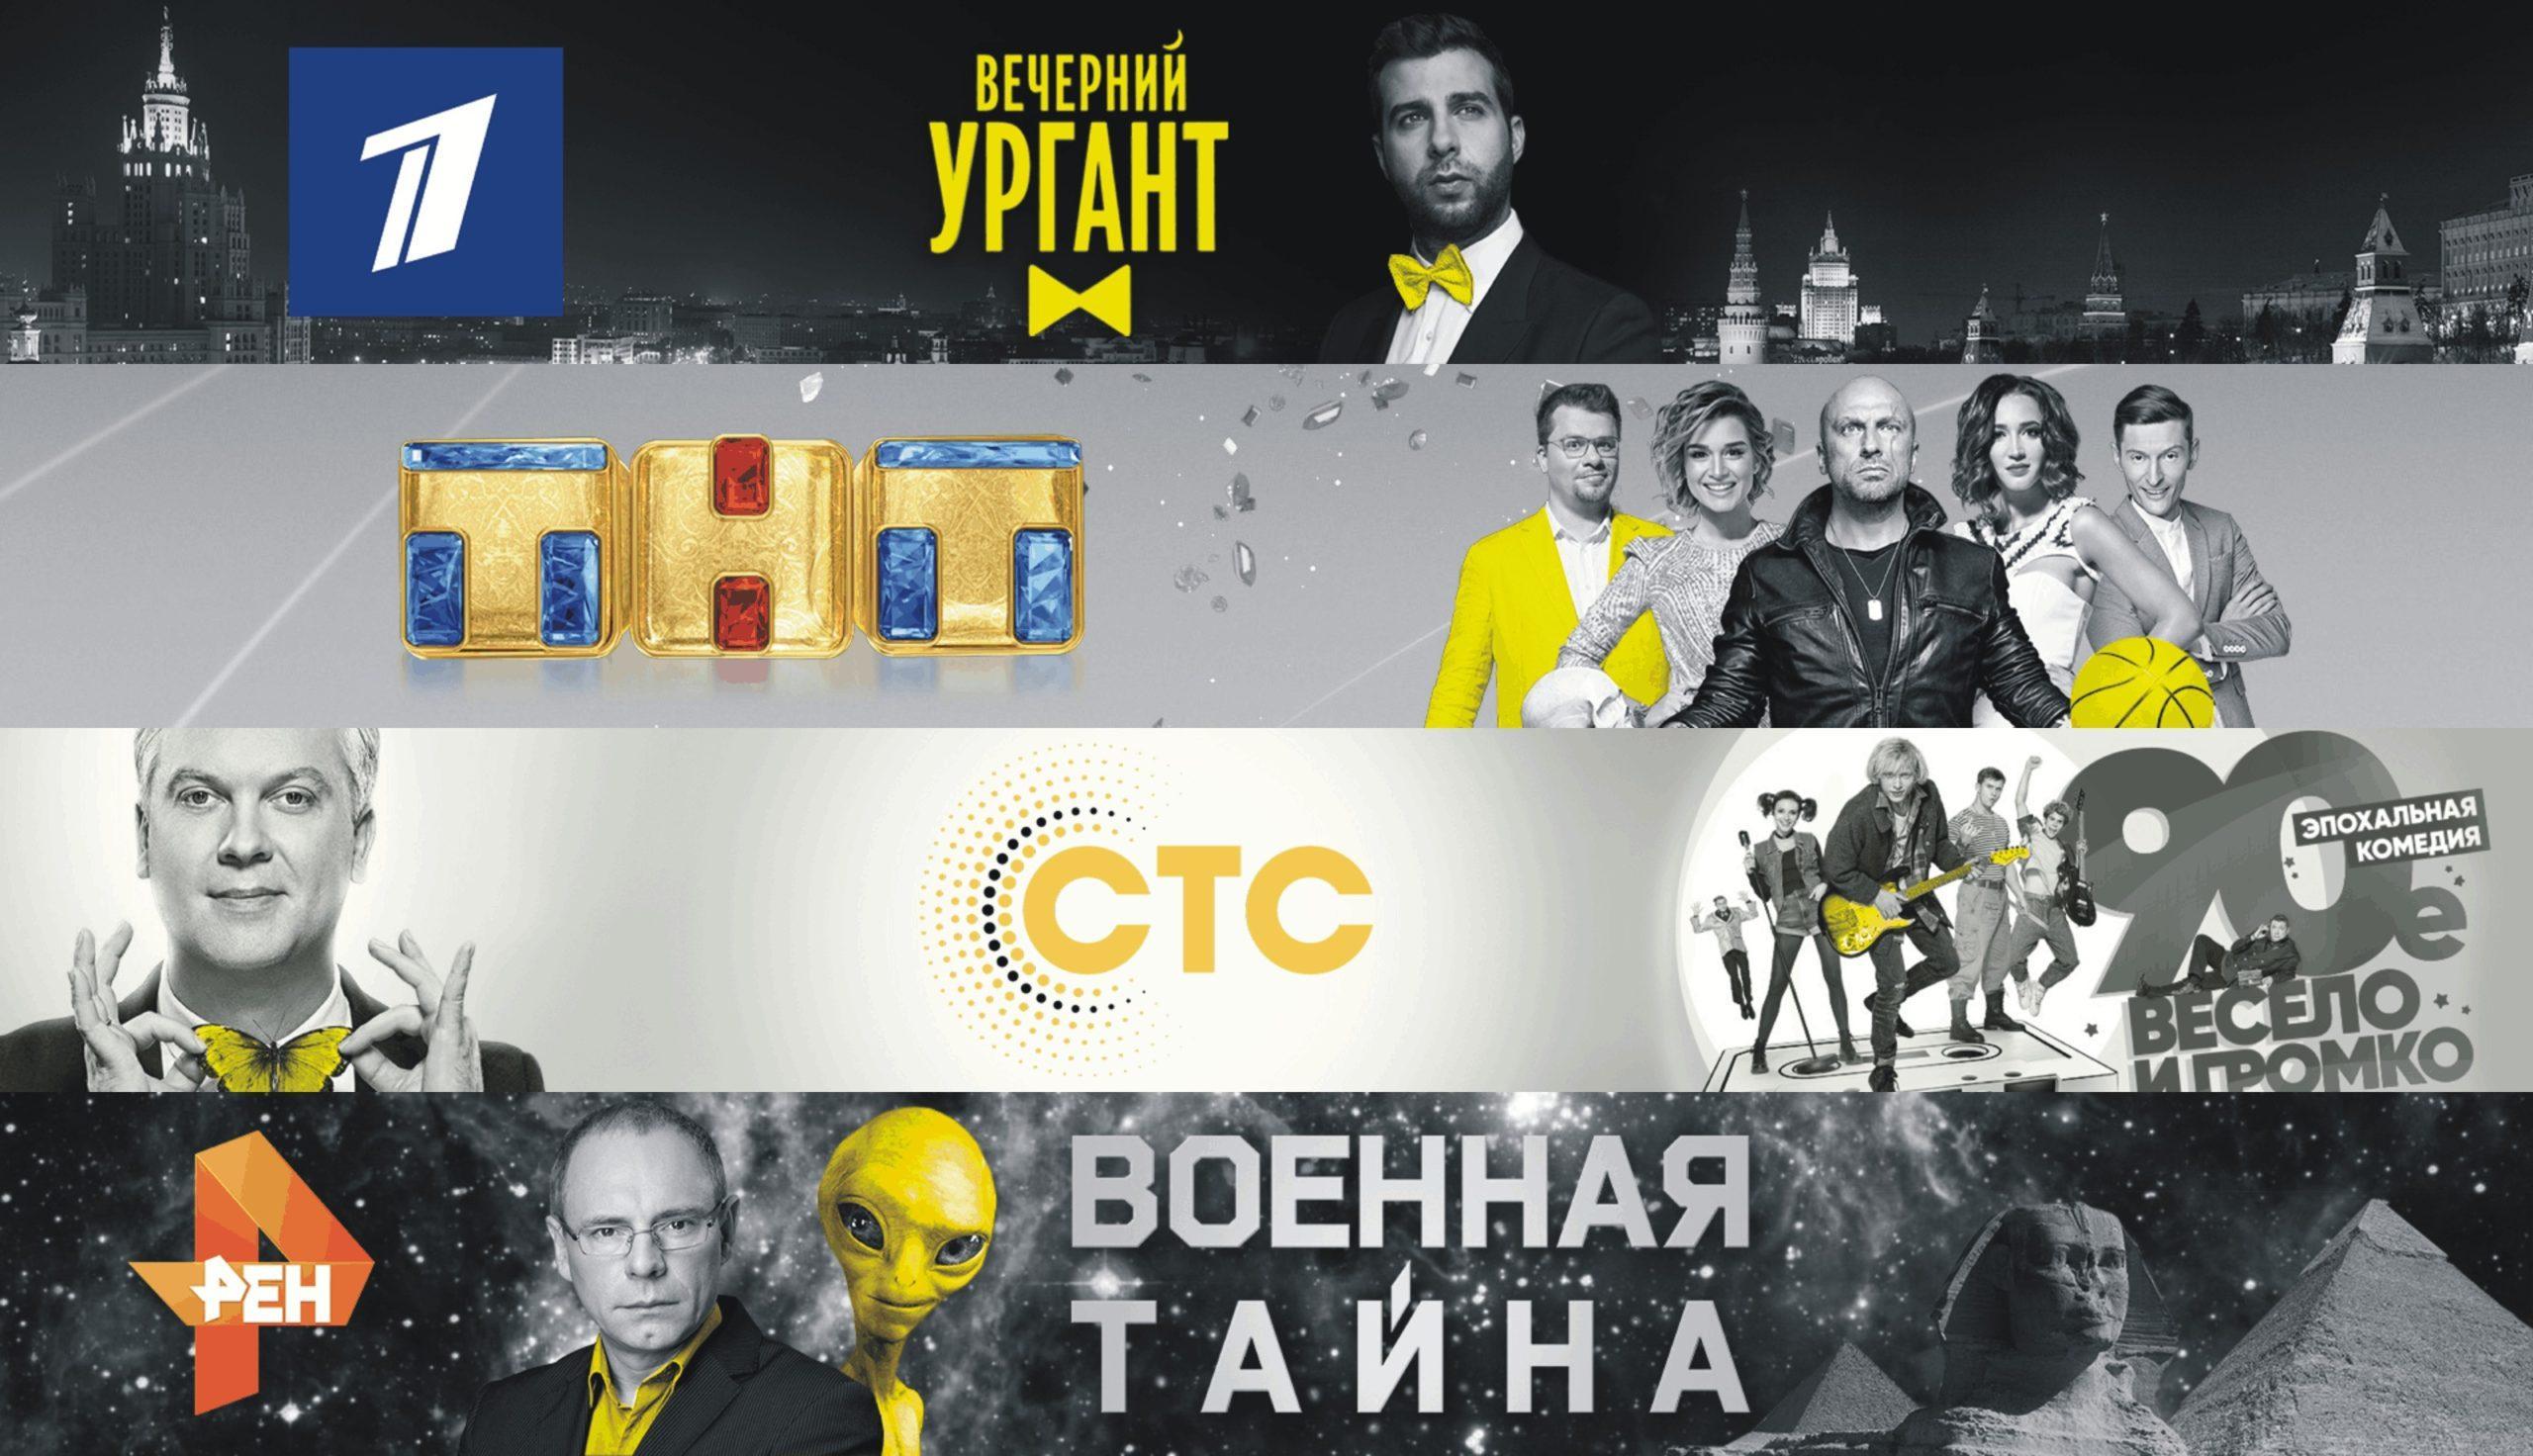 Реклама ТВ Новосибирск Цена